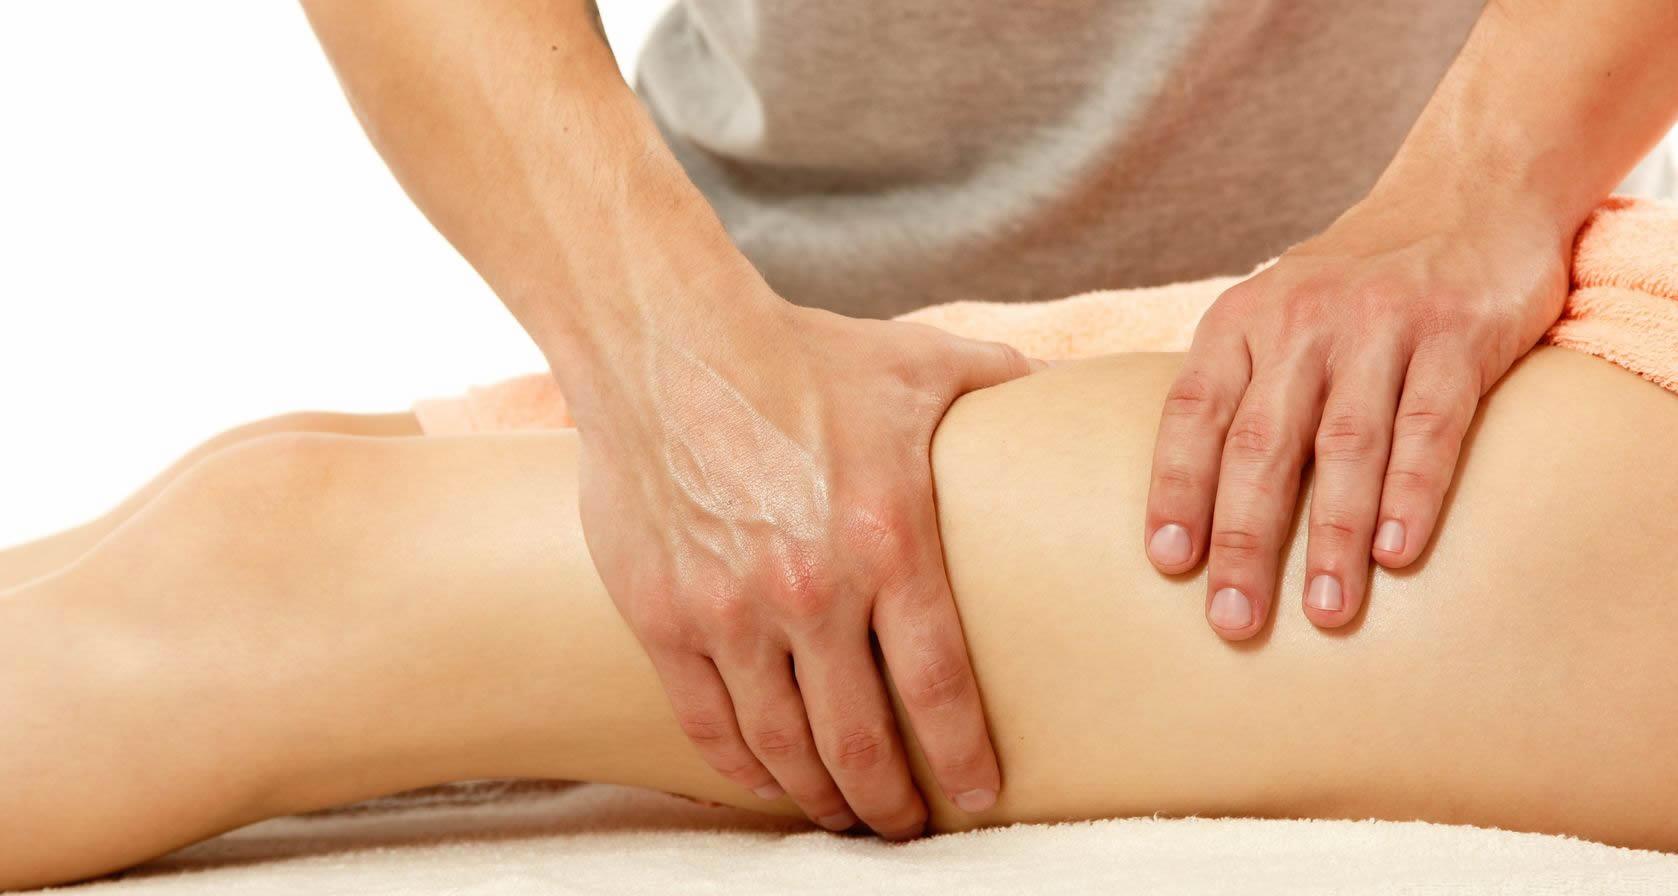 Aqueous Cellulite: Kneading and pressing is the adequate Anti-cellulite massage technique